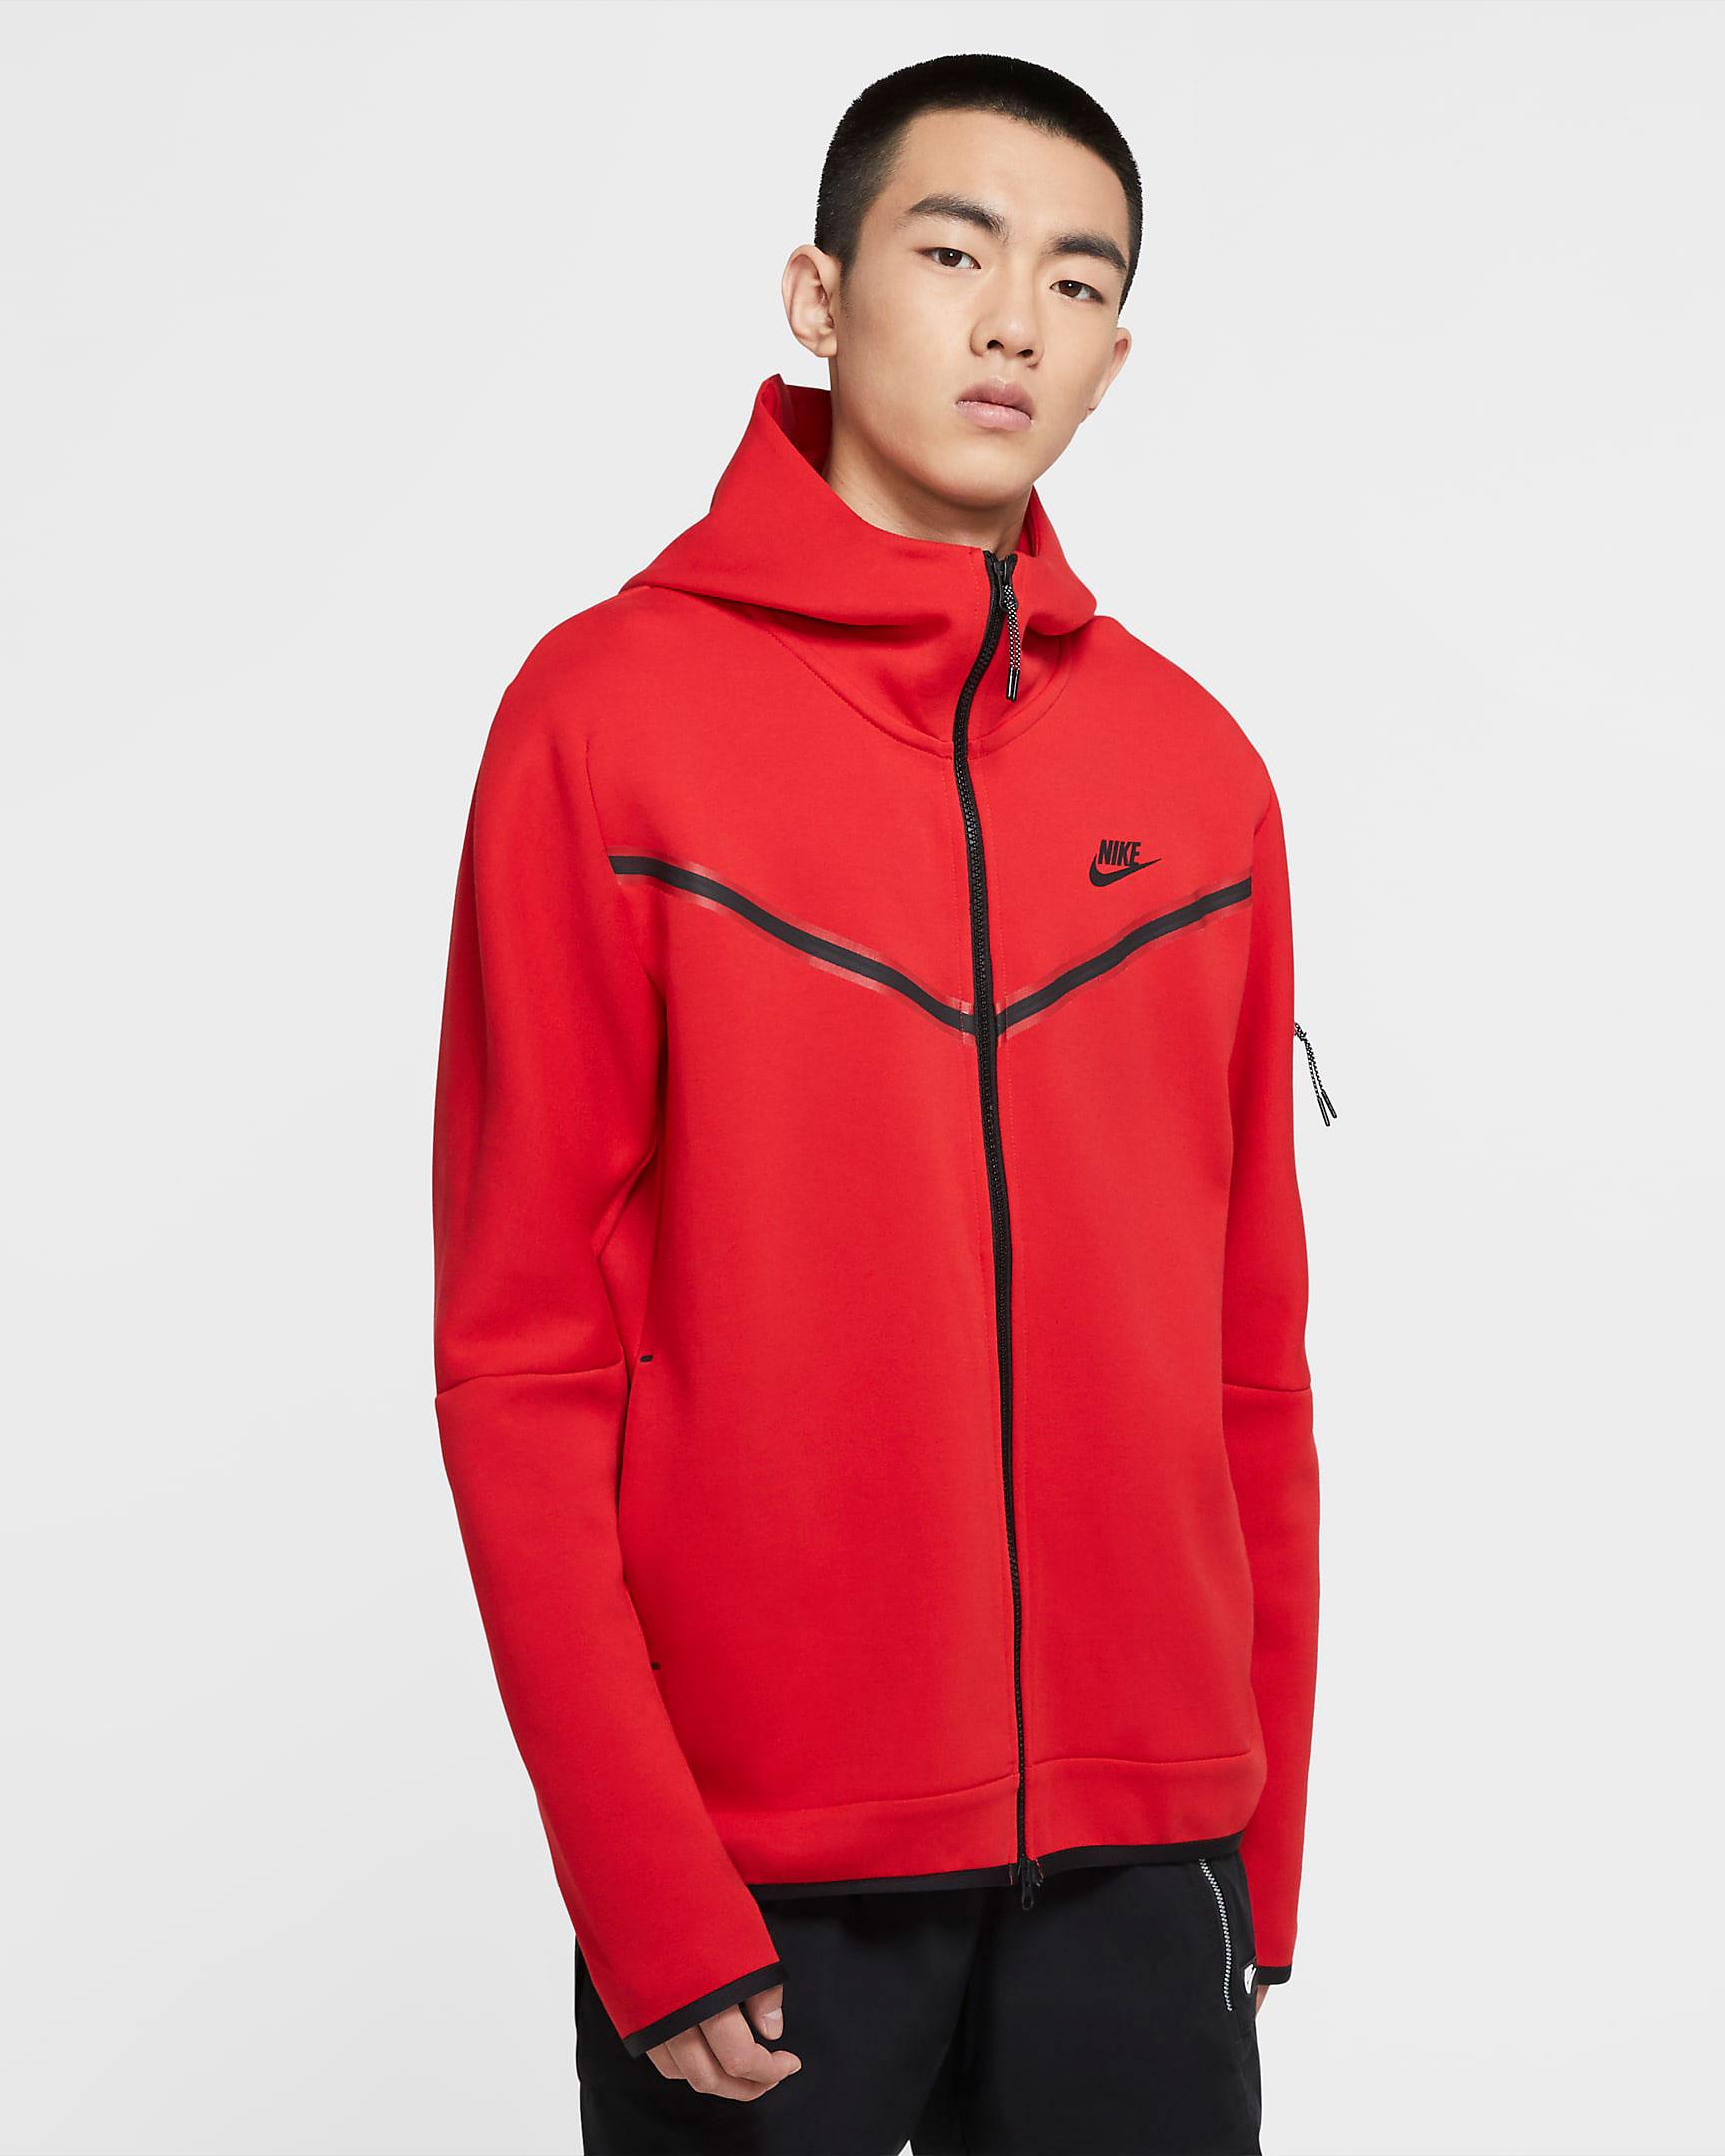 nike-air-max-90-nordic-christmas-tech-fleece-hoodie